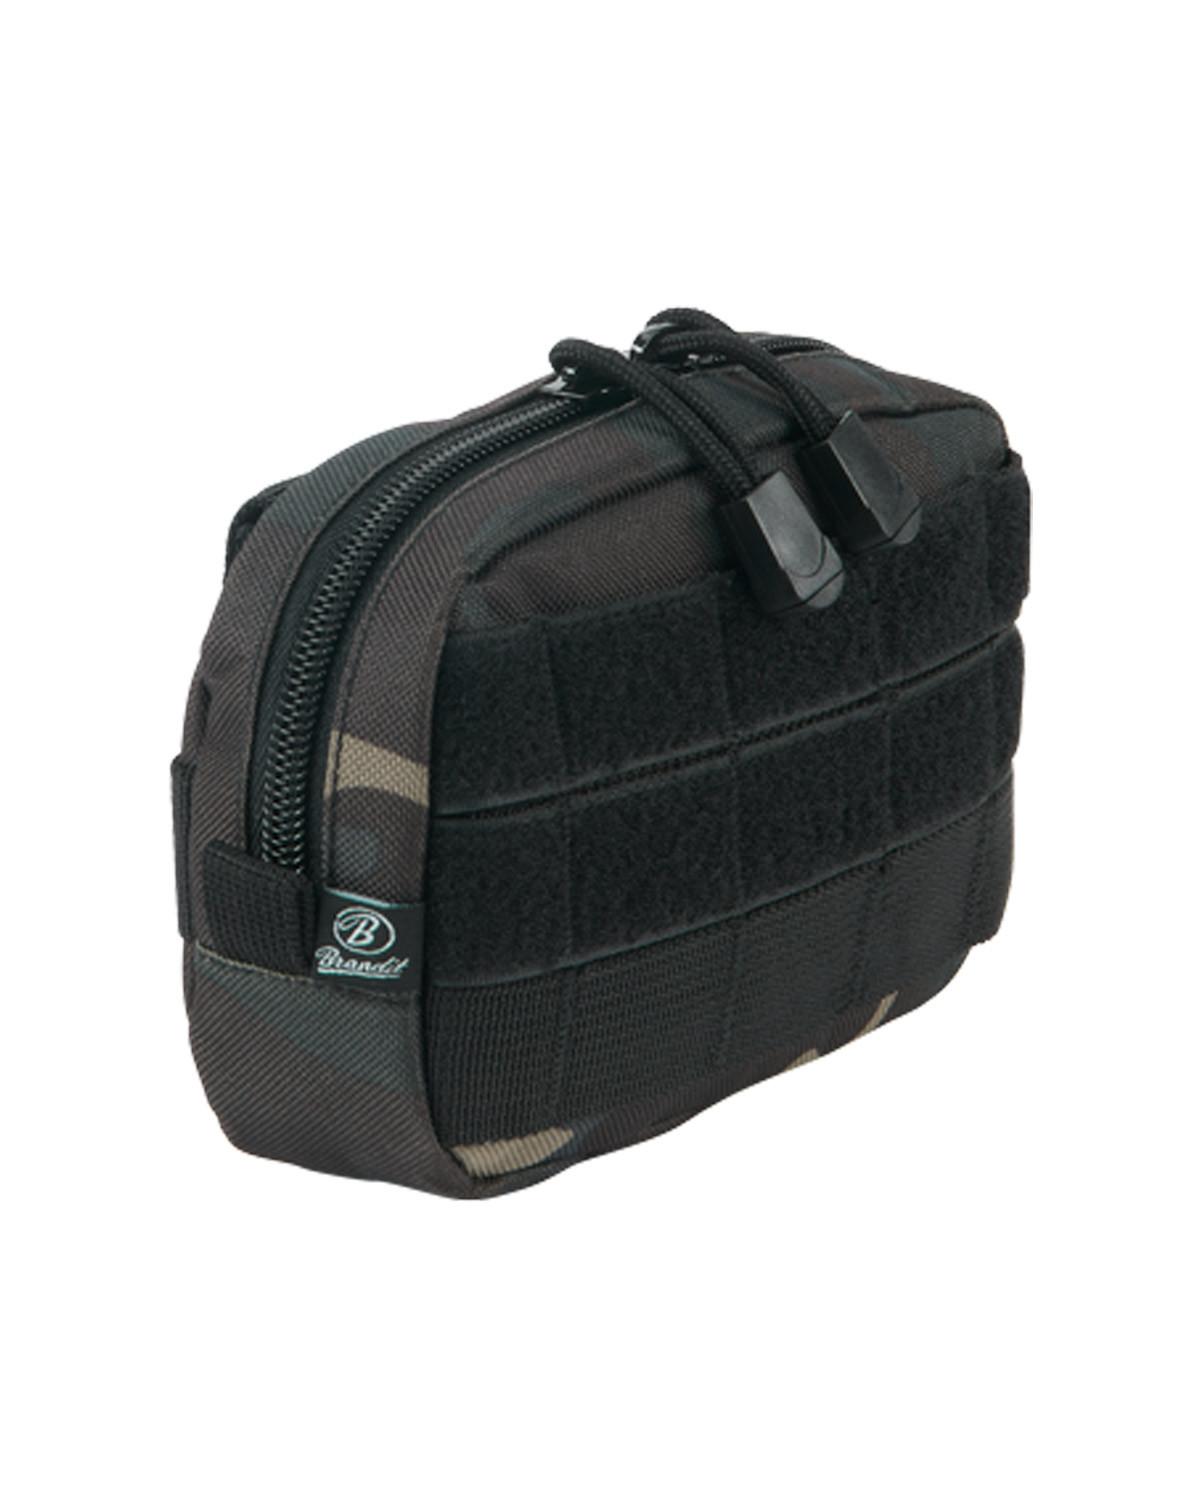 Brandit MOLLE Compact Pouch (Dark Camo, One Size)